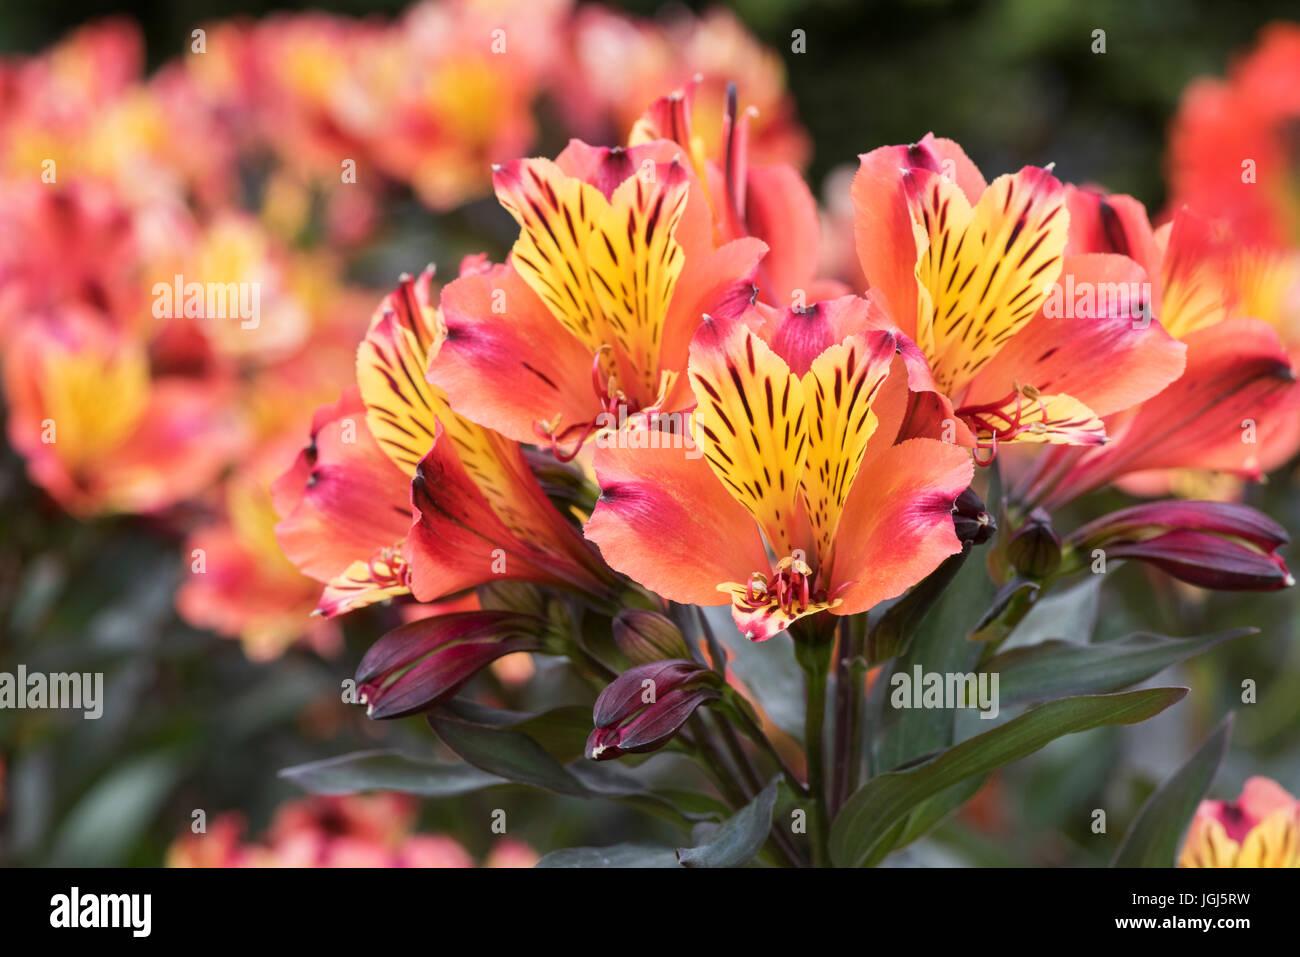 Alstroemeria indian summer peruvian lily flowers stock photo peruvian lily flowers izmirmasajfo